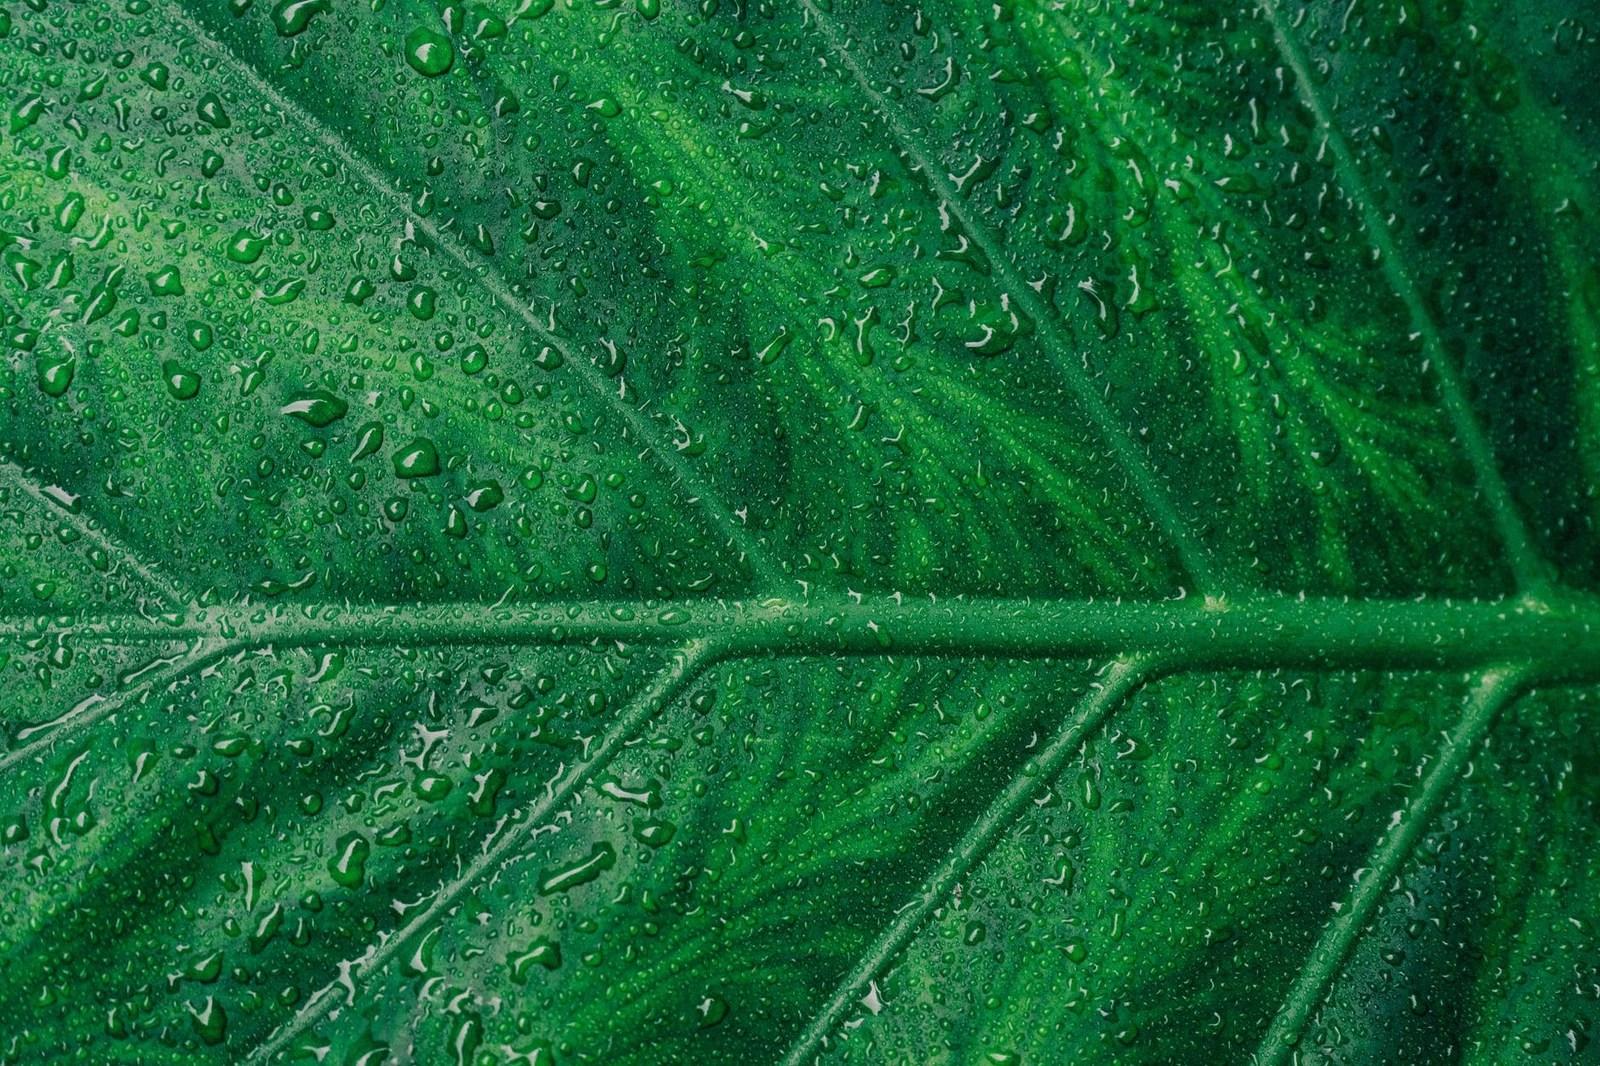 Grande feuille verte